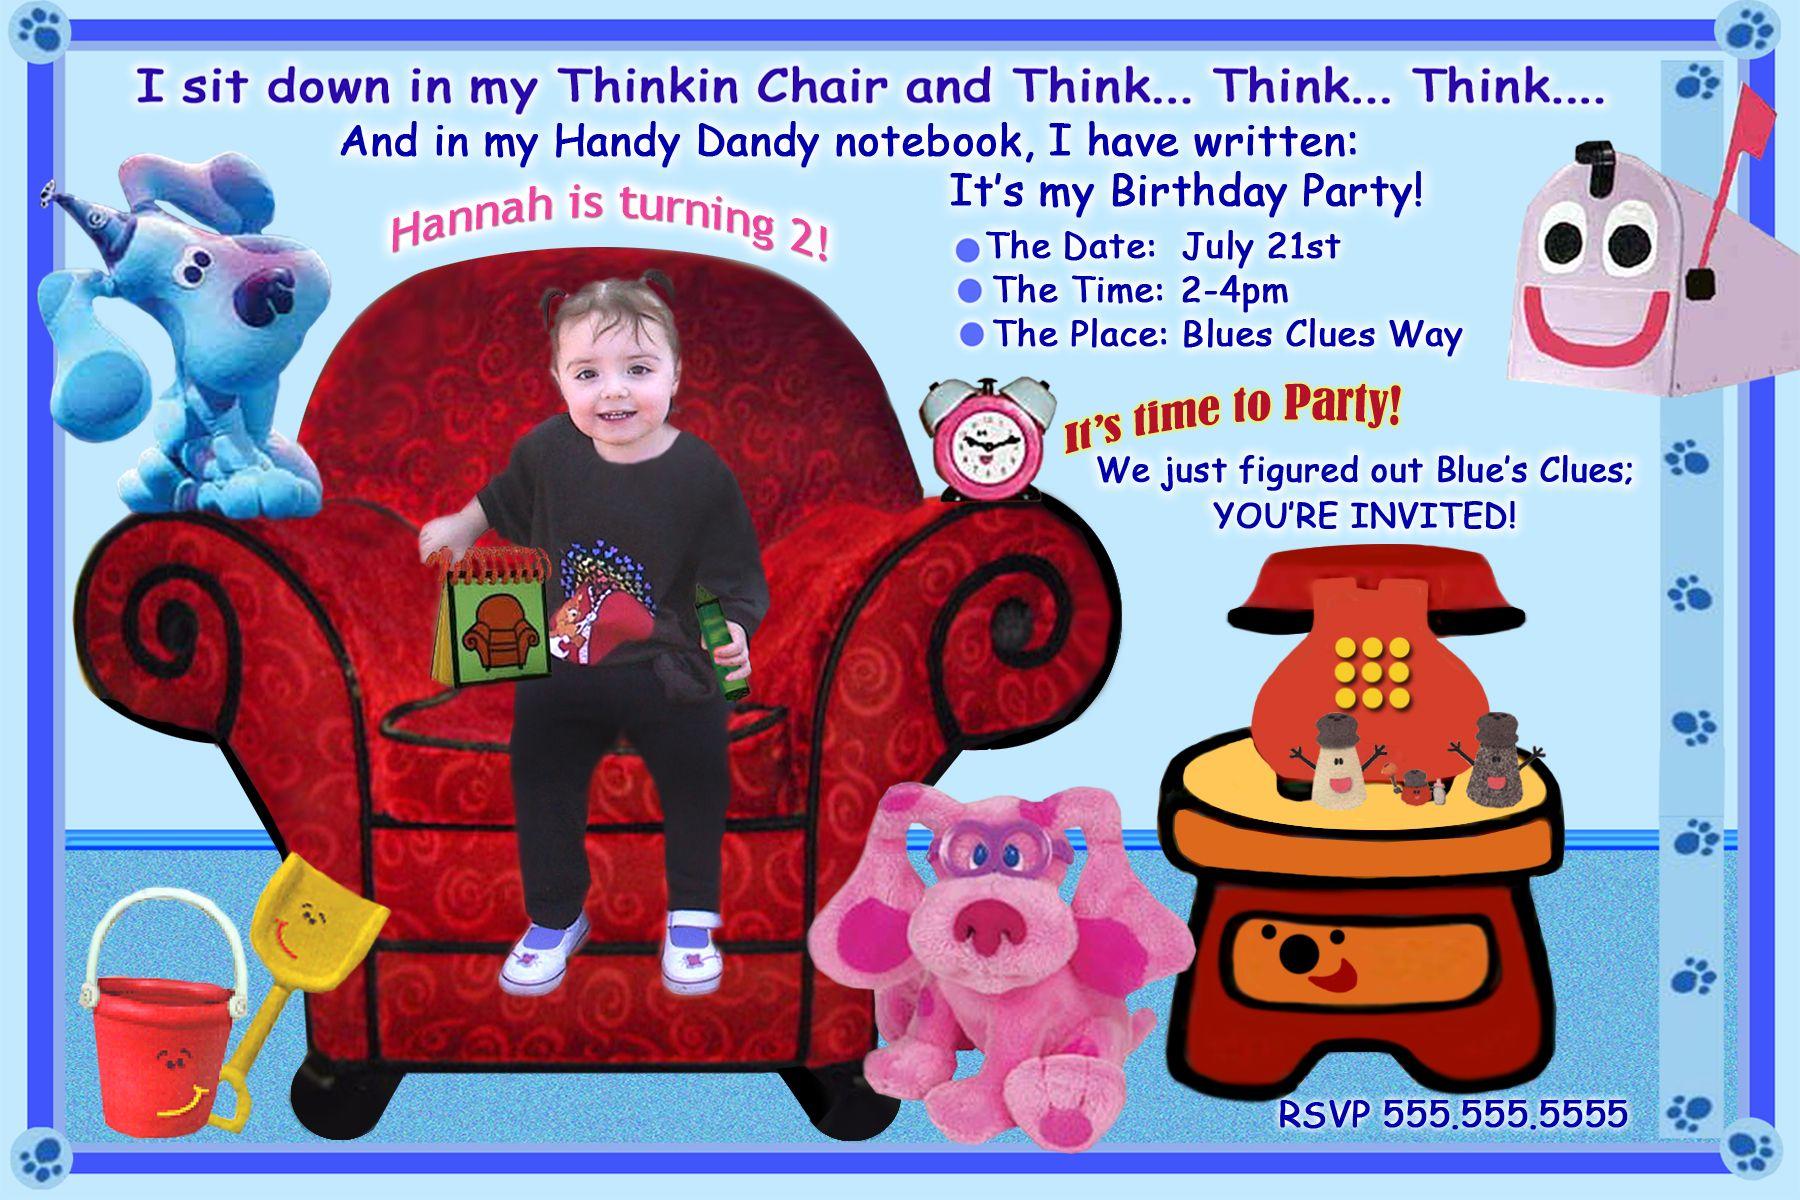 Free Blues Clues Birthday Invitations Ideas Printable Birthday Invitations Birthday Party Invitations Printable Free Printable Birthday Invitations